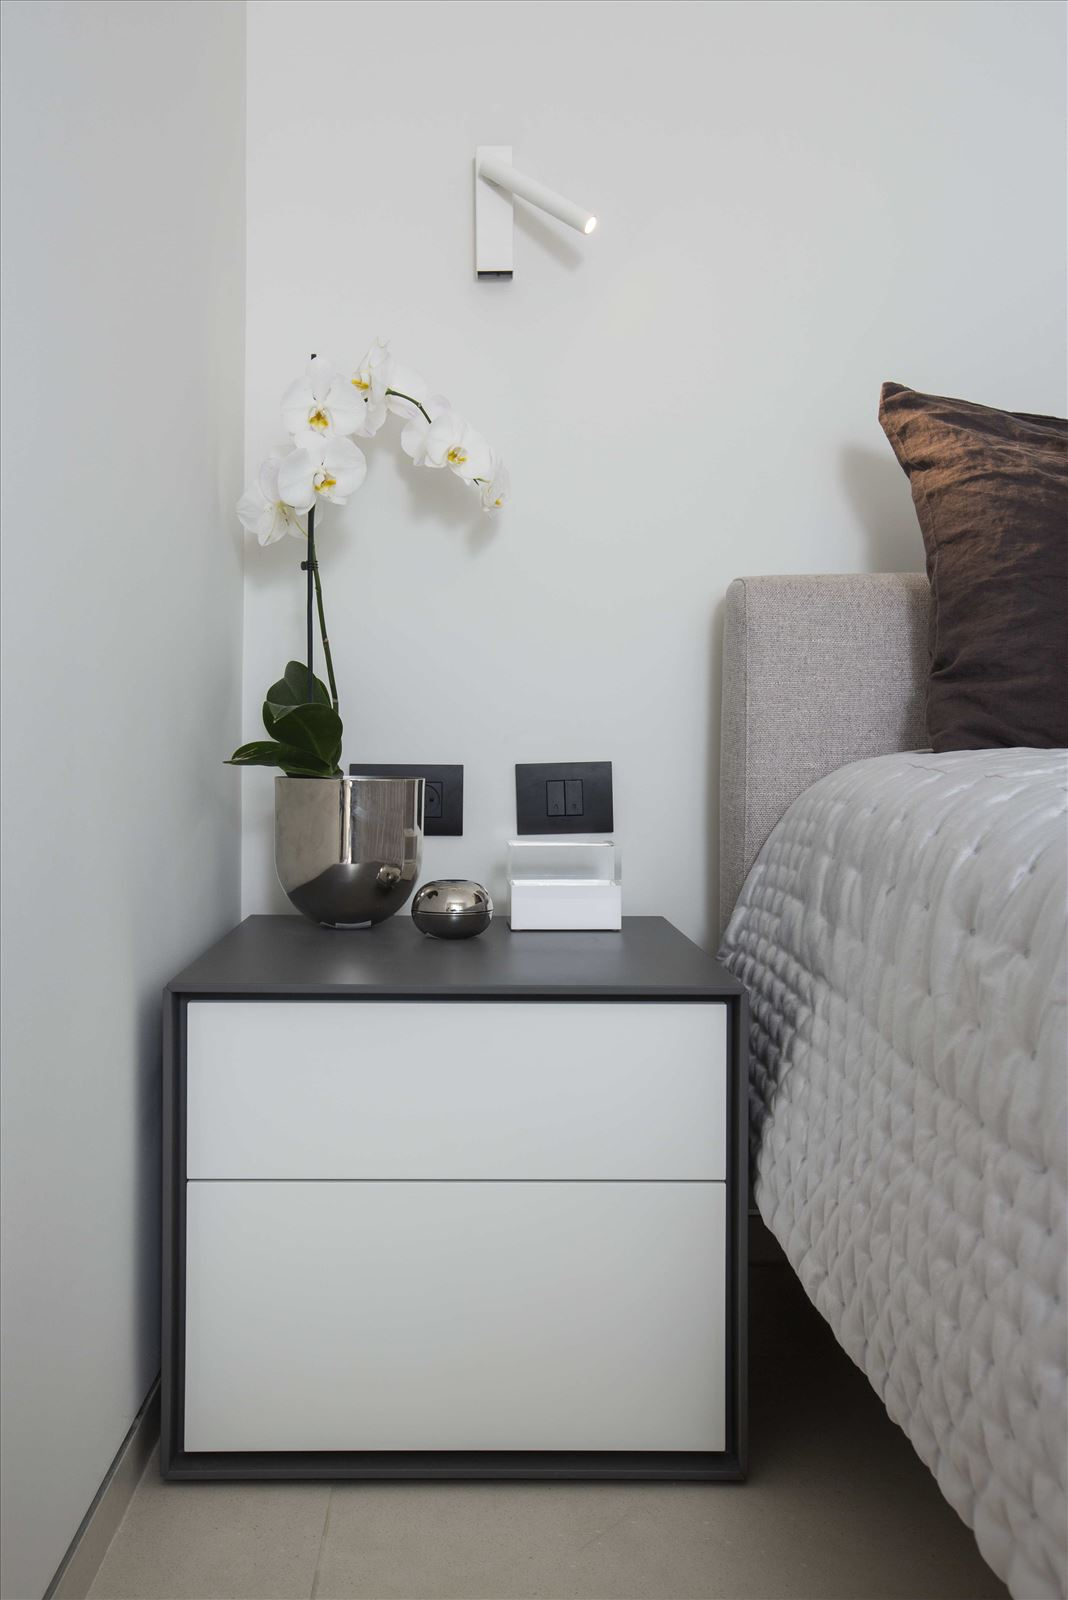 Tel Aviv apartment in Parisian aroma תאורה בחדר נעשתה על ידי דורי קמחי